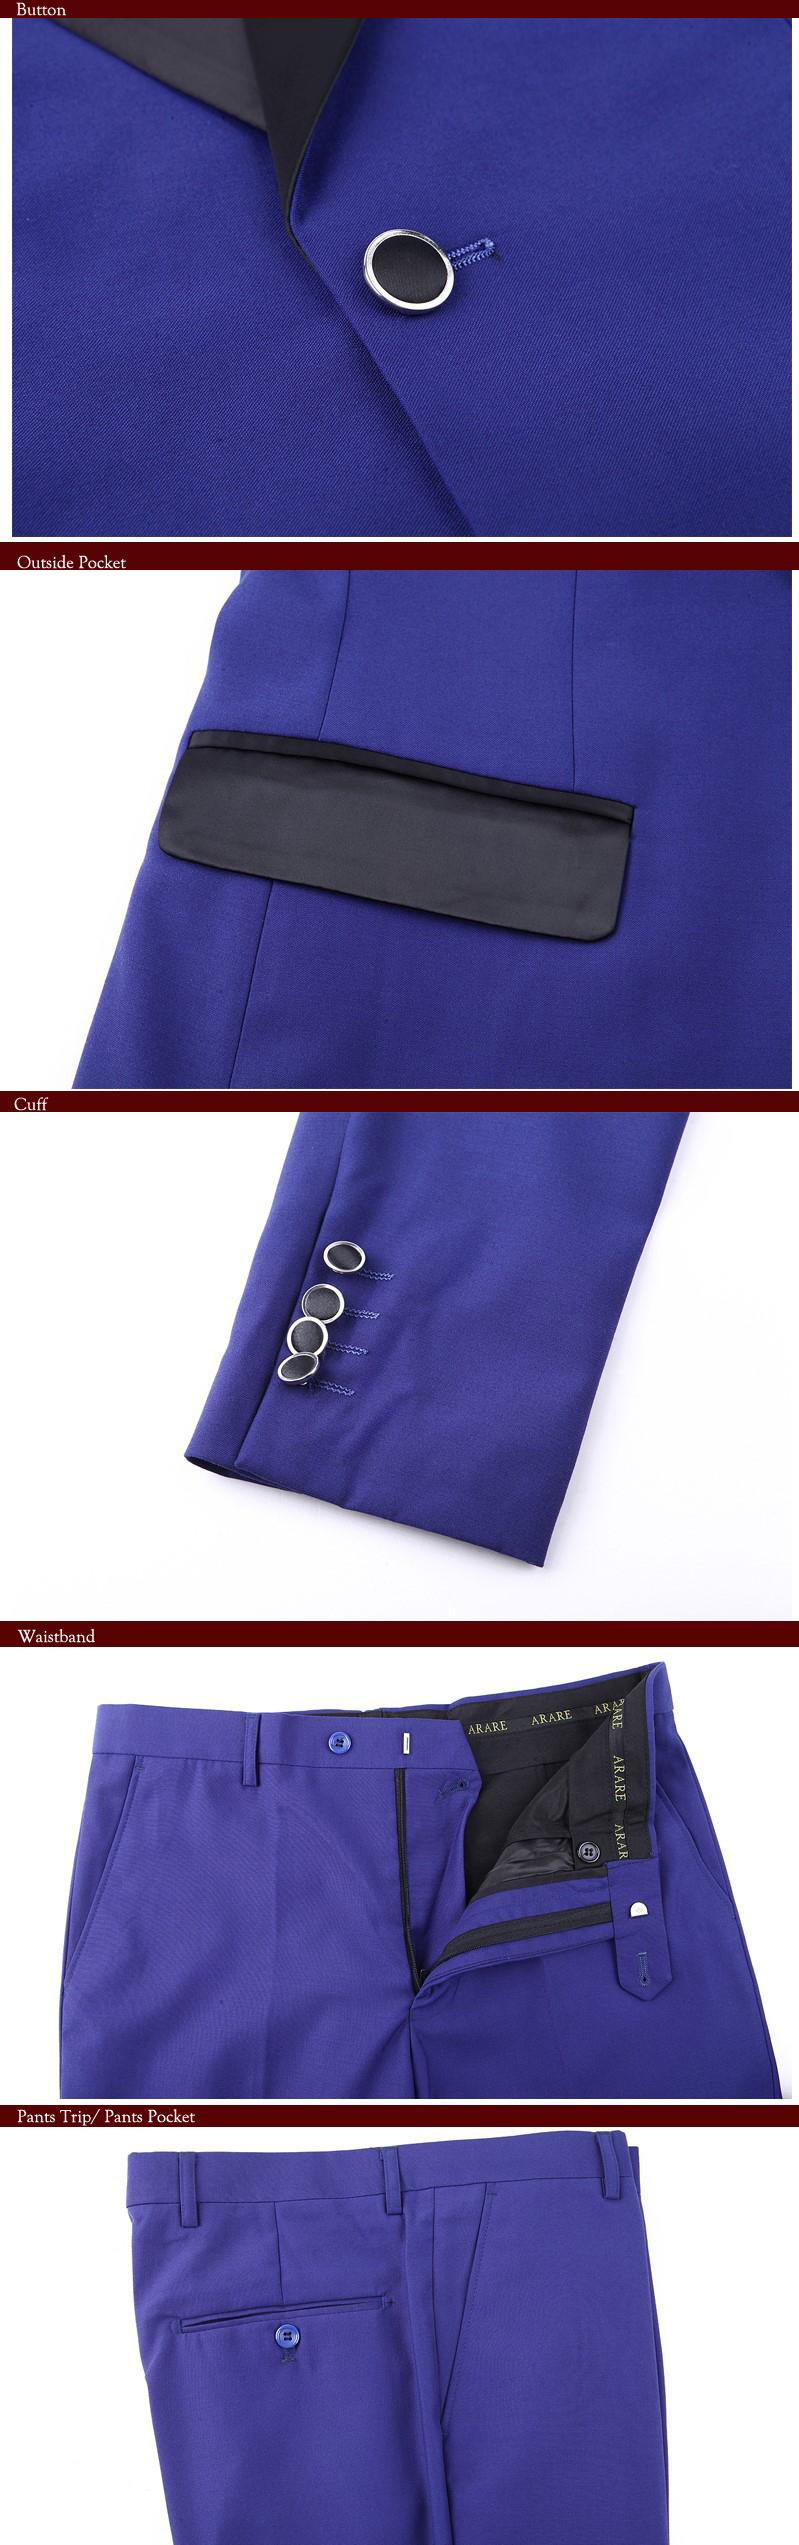 HTB1Db0vaPgy uJjSZKzq6z jXXaB - Men Wedding Dress Suits 2017 Latest 5 piece Groom Wedding Suit Set Slim Fit Round Collar Prom Party Black-tie Dress